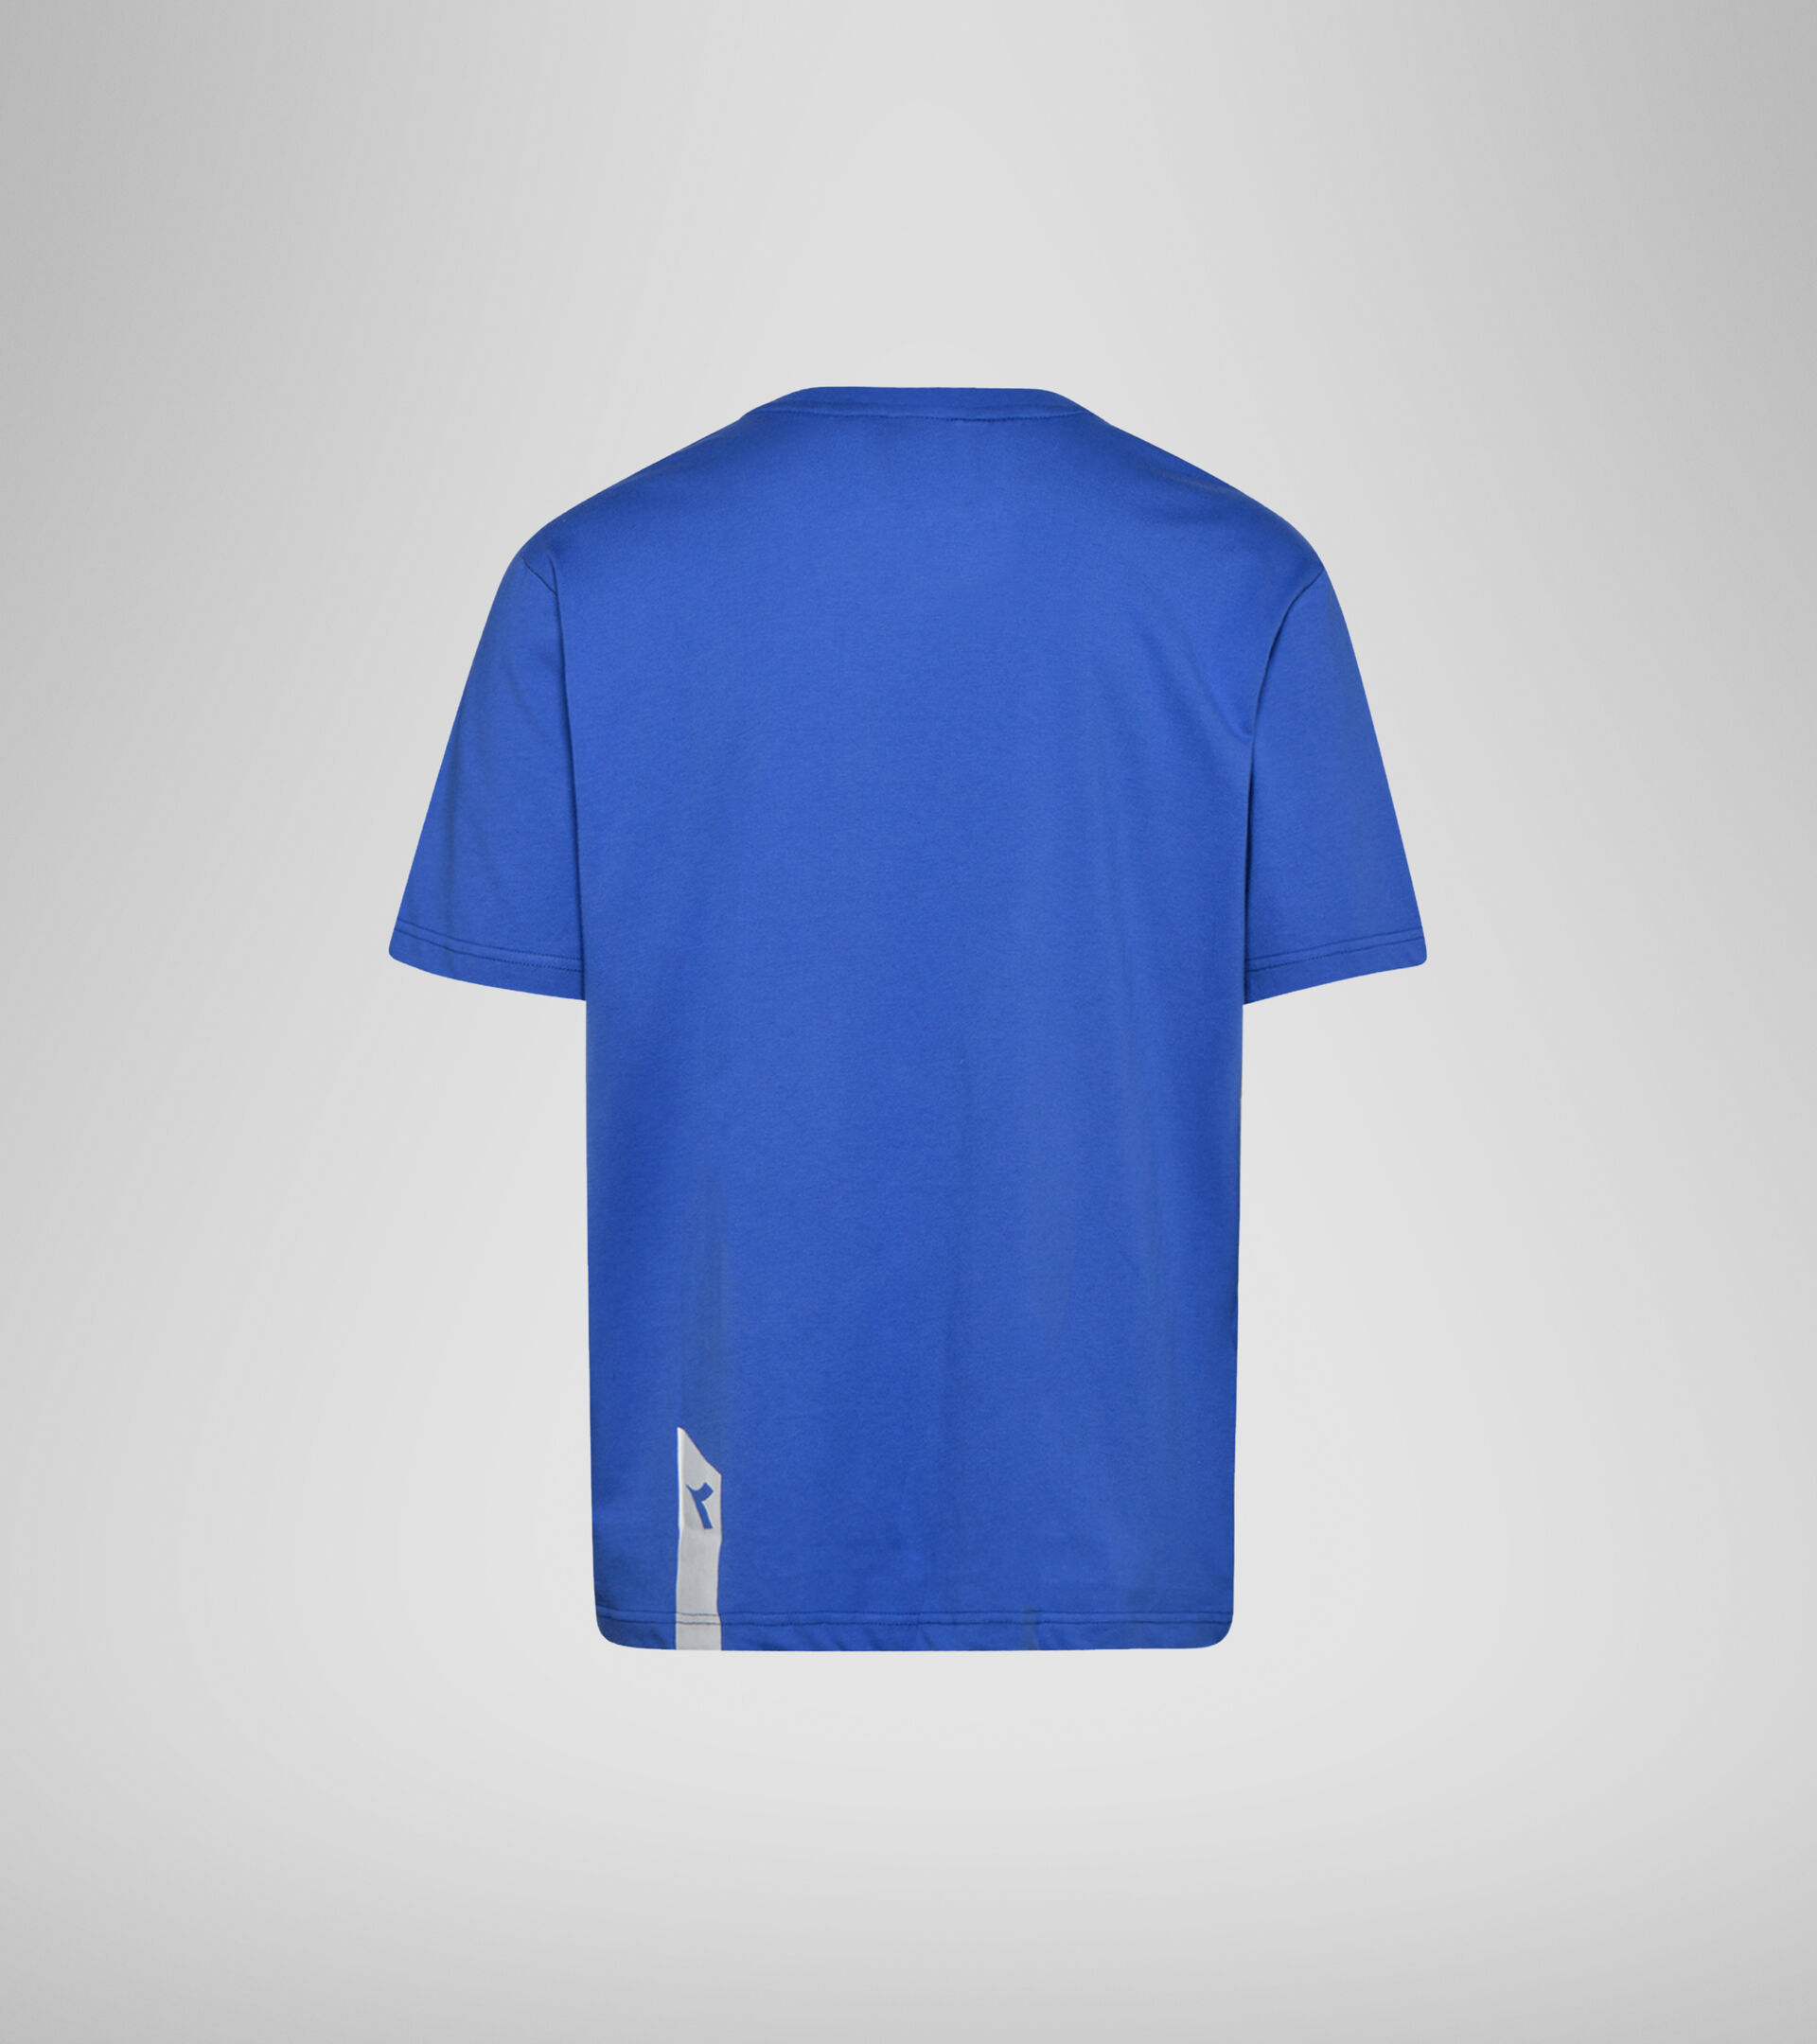 T-shirt - Unisex T-SHIRT SS ICON AMPARO BLAU - Diadora